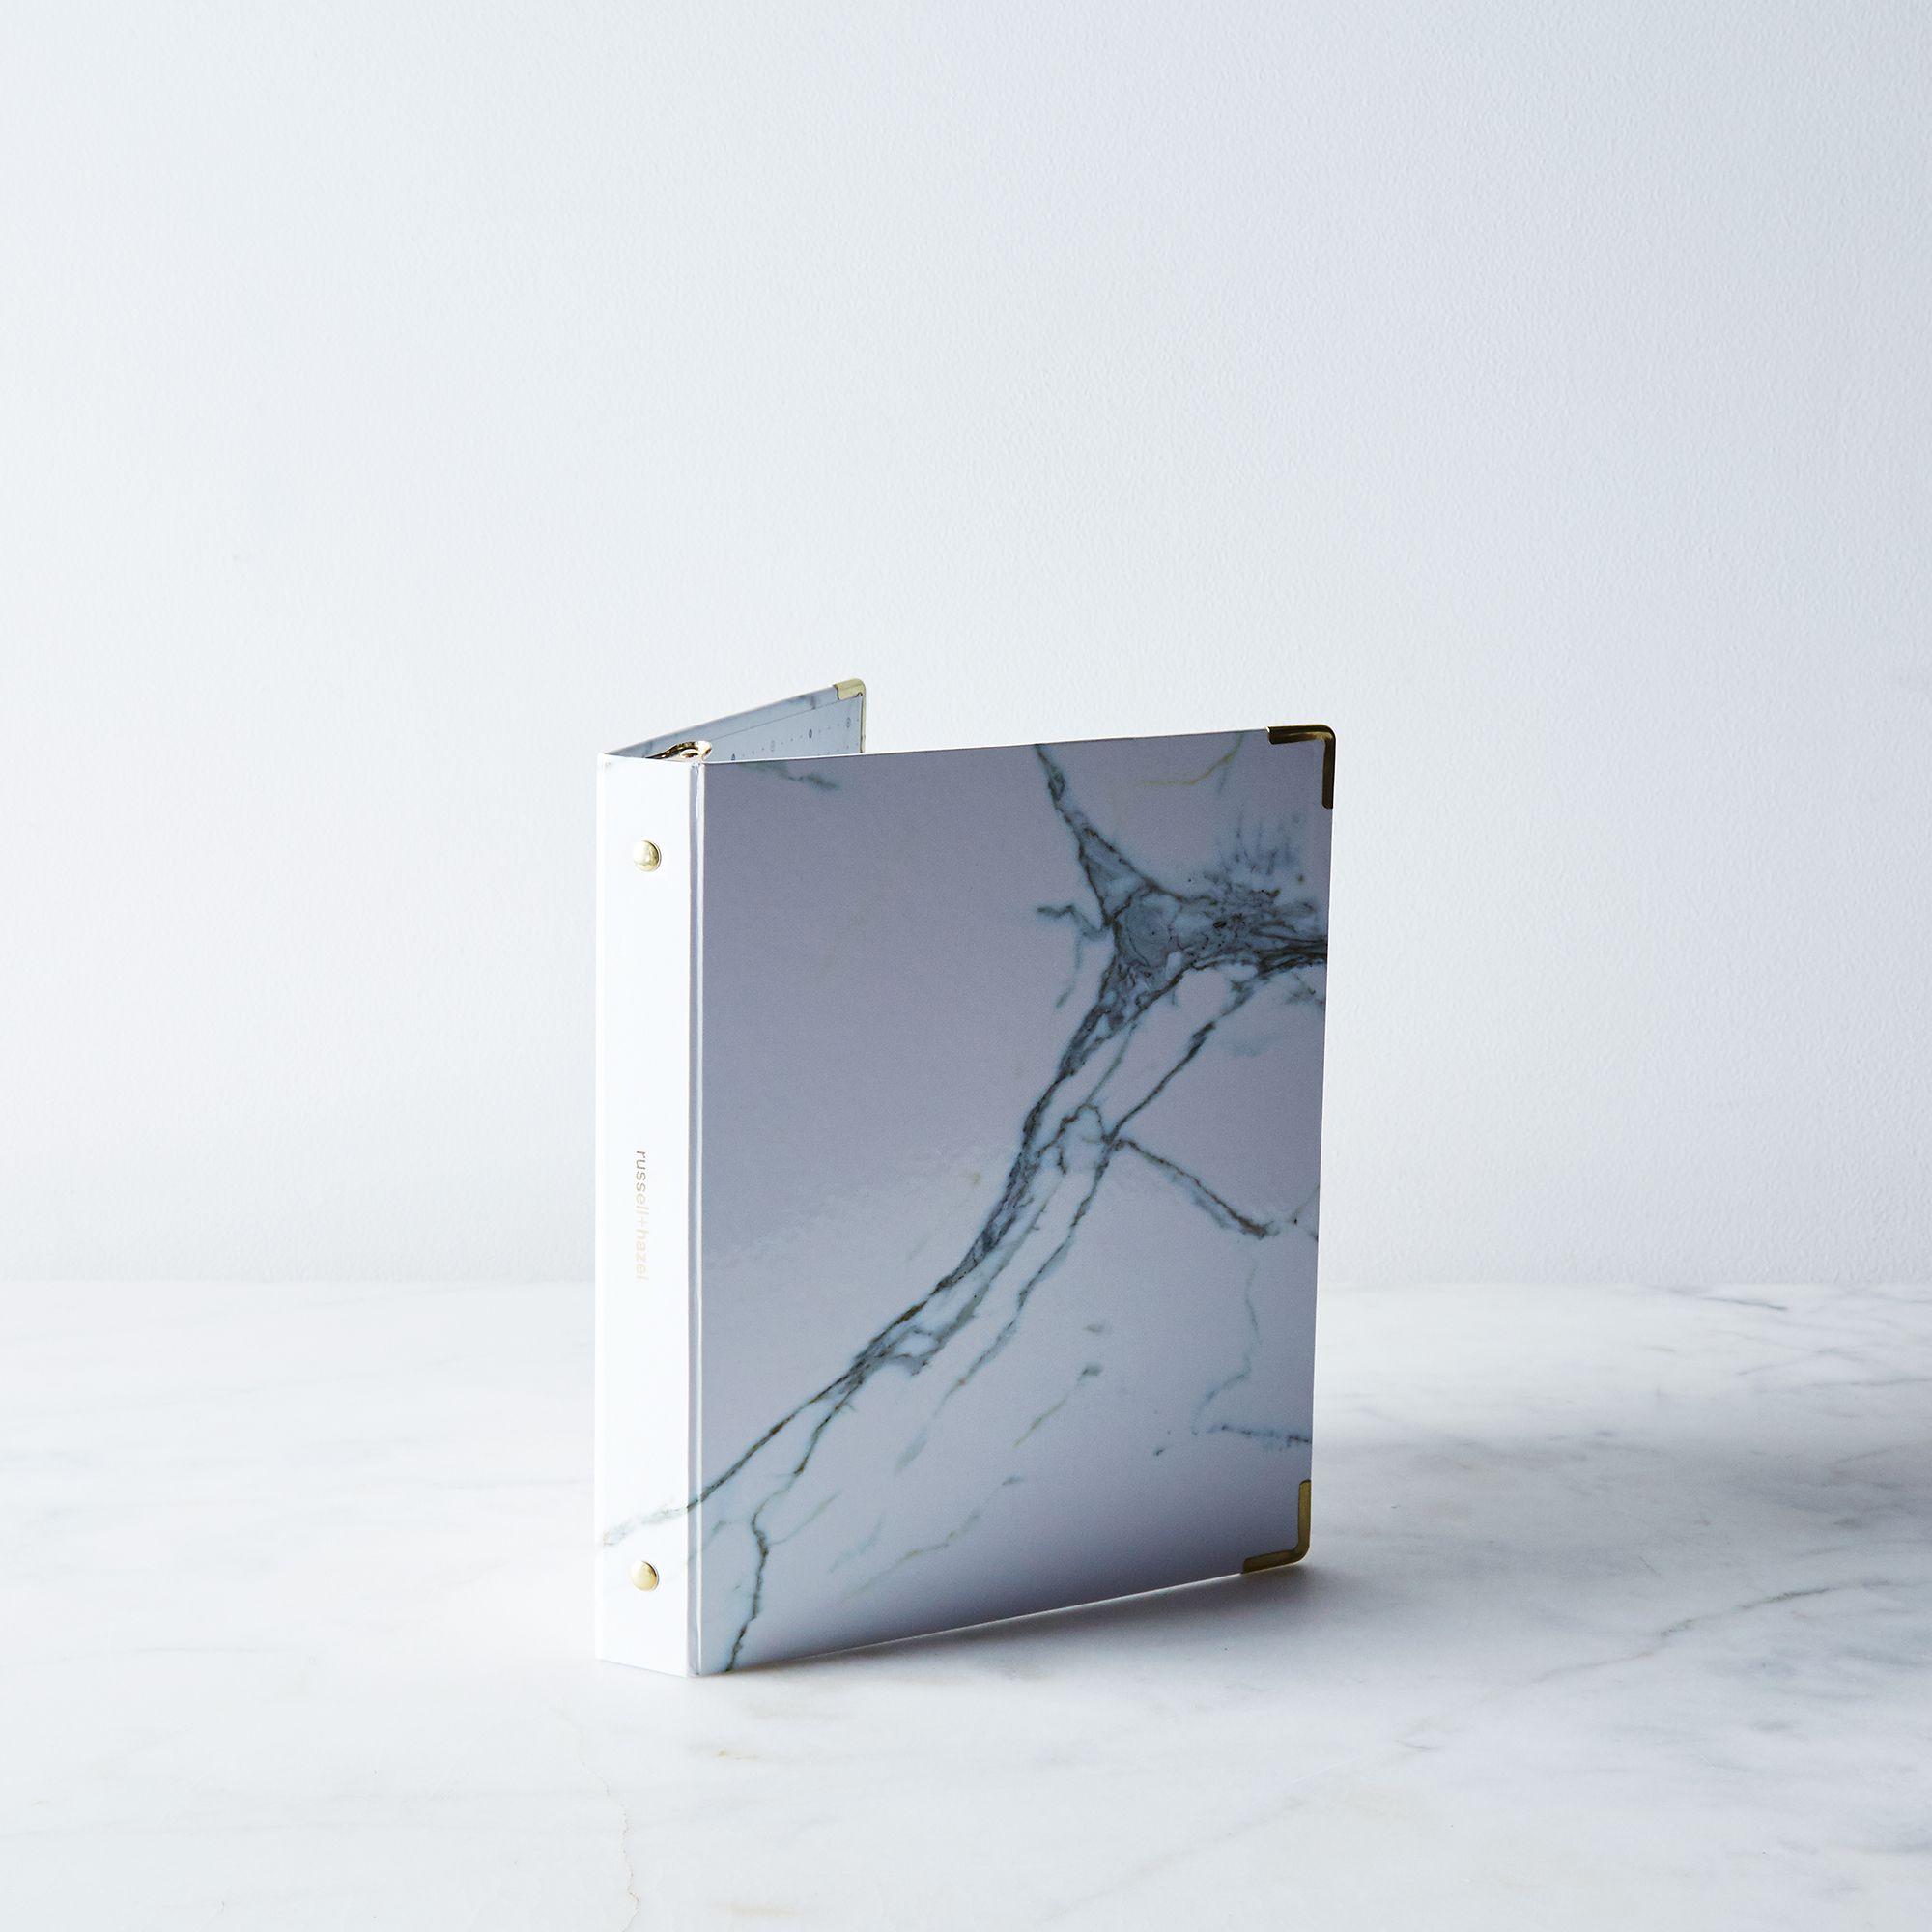 E3a9494e a0f8 11e5 a190 0ef7535729df  2015 0916 russell hazel mini binder marble silo bobbi lin 2451